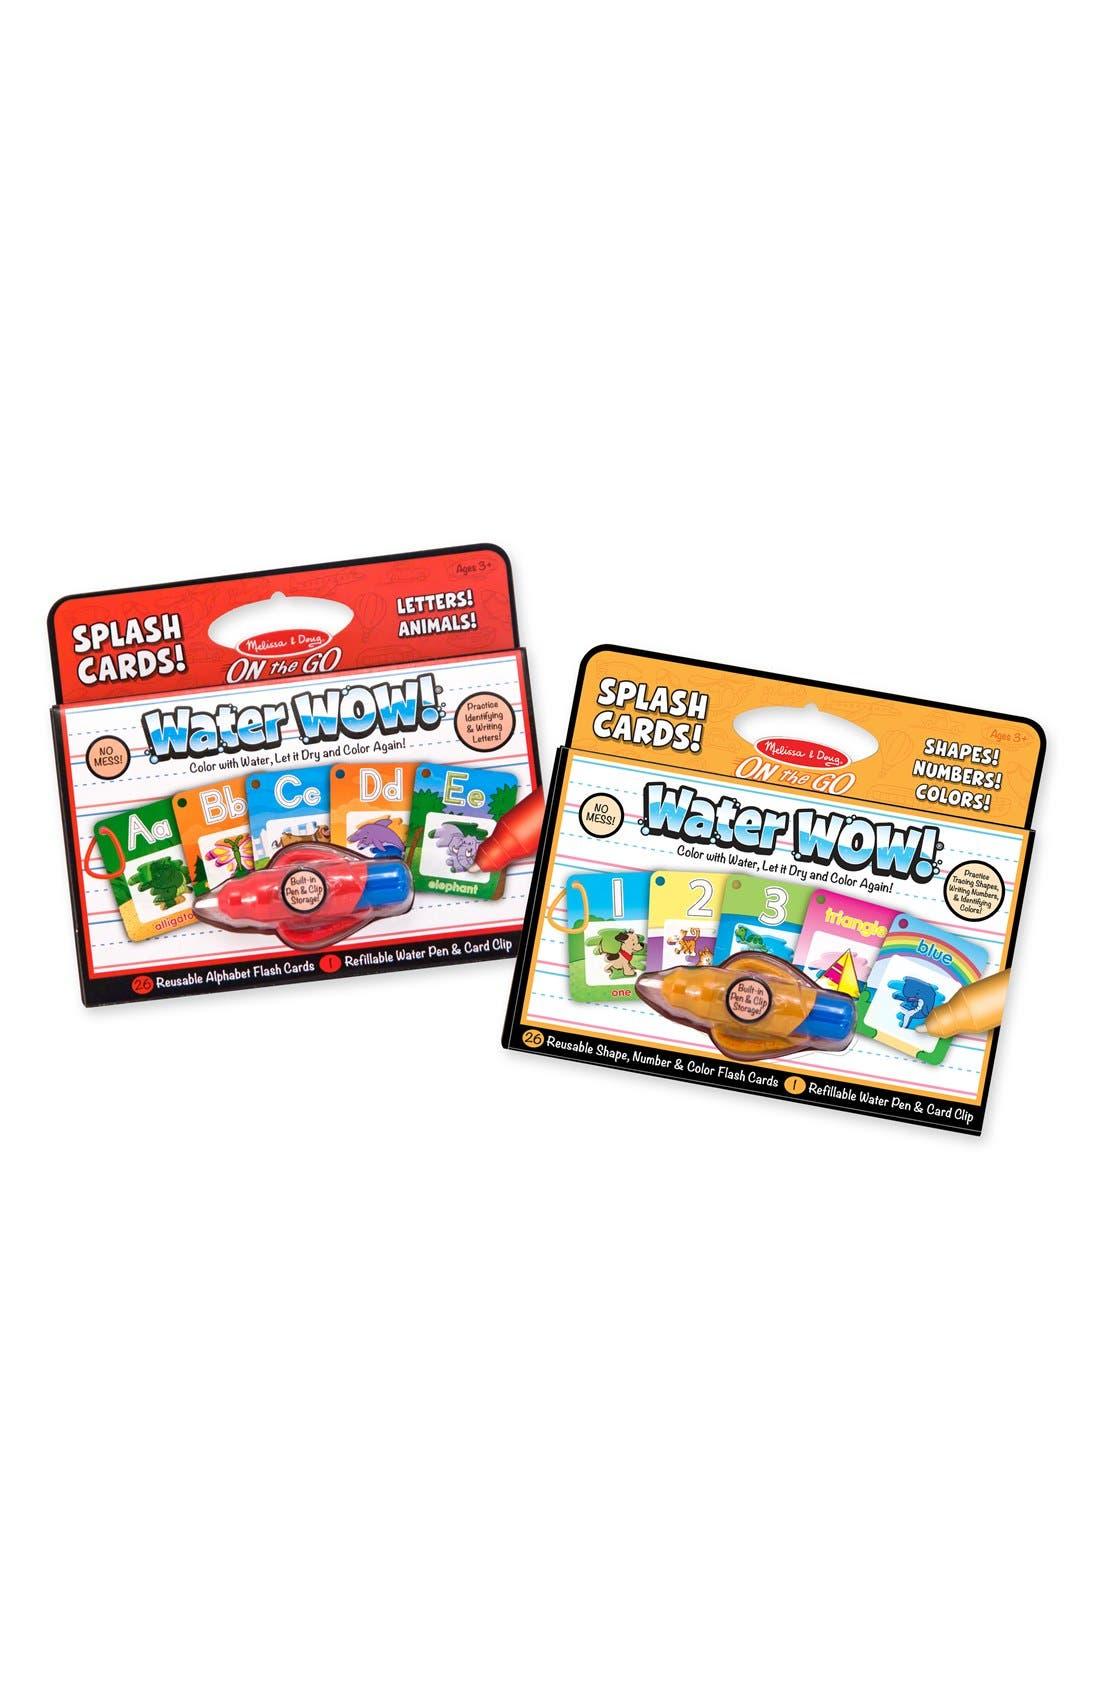 Main Image - Melissa & Doug 'Water WOW!' Splash Cards Set